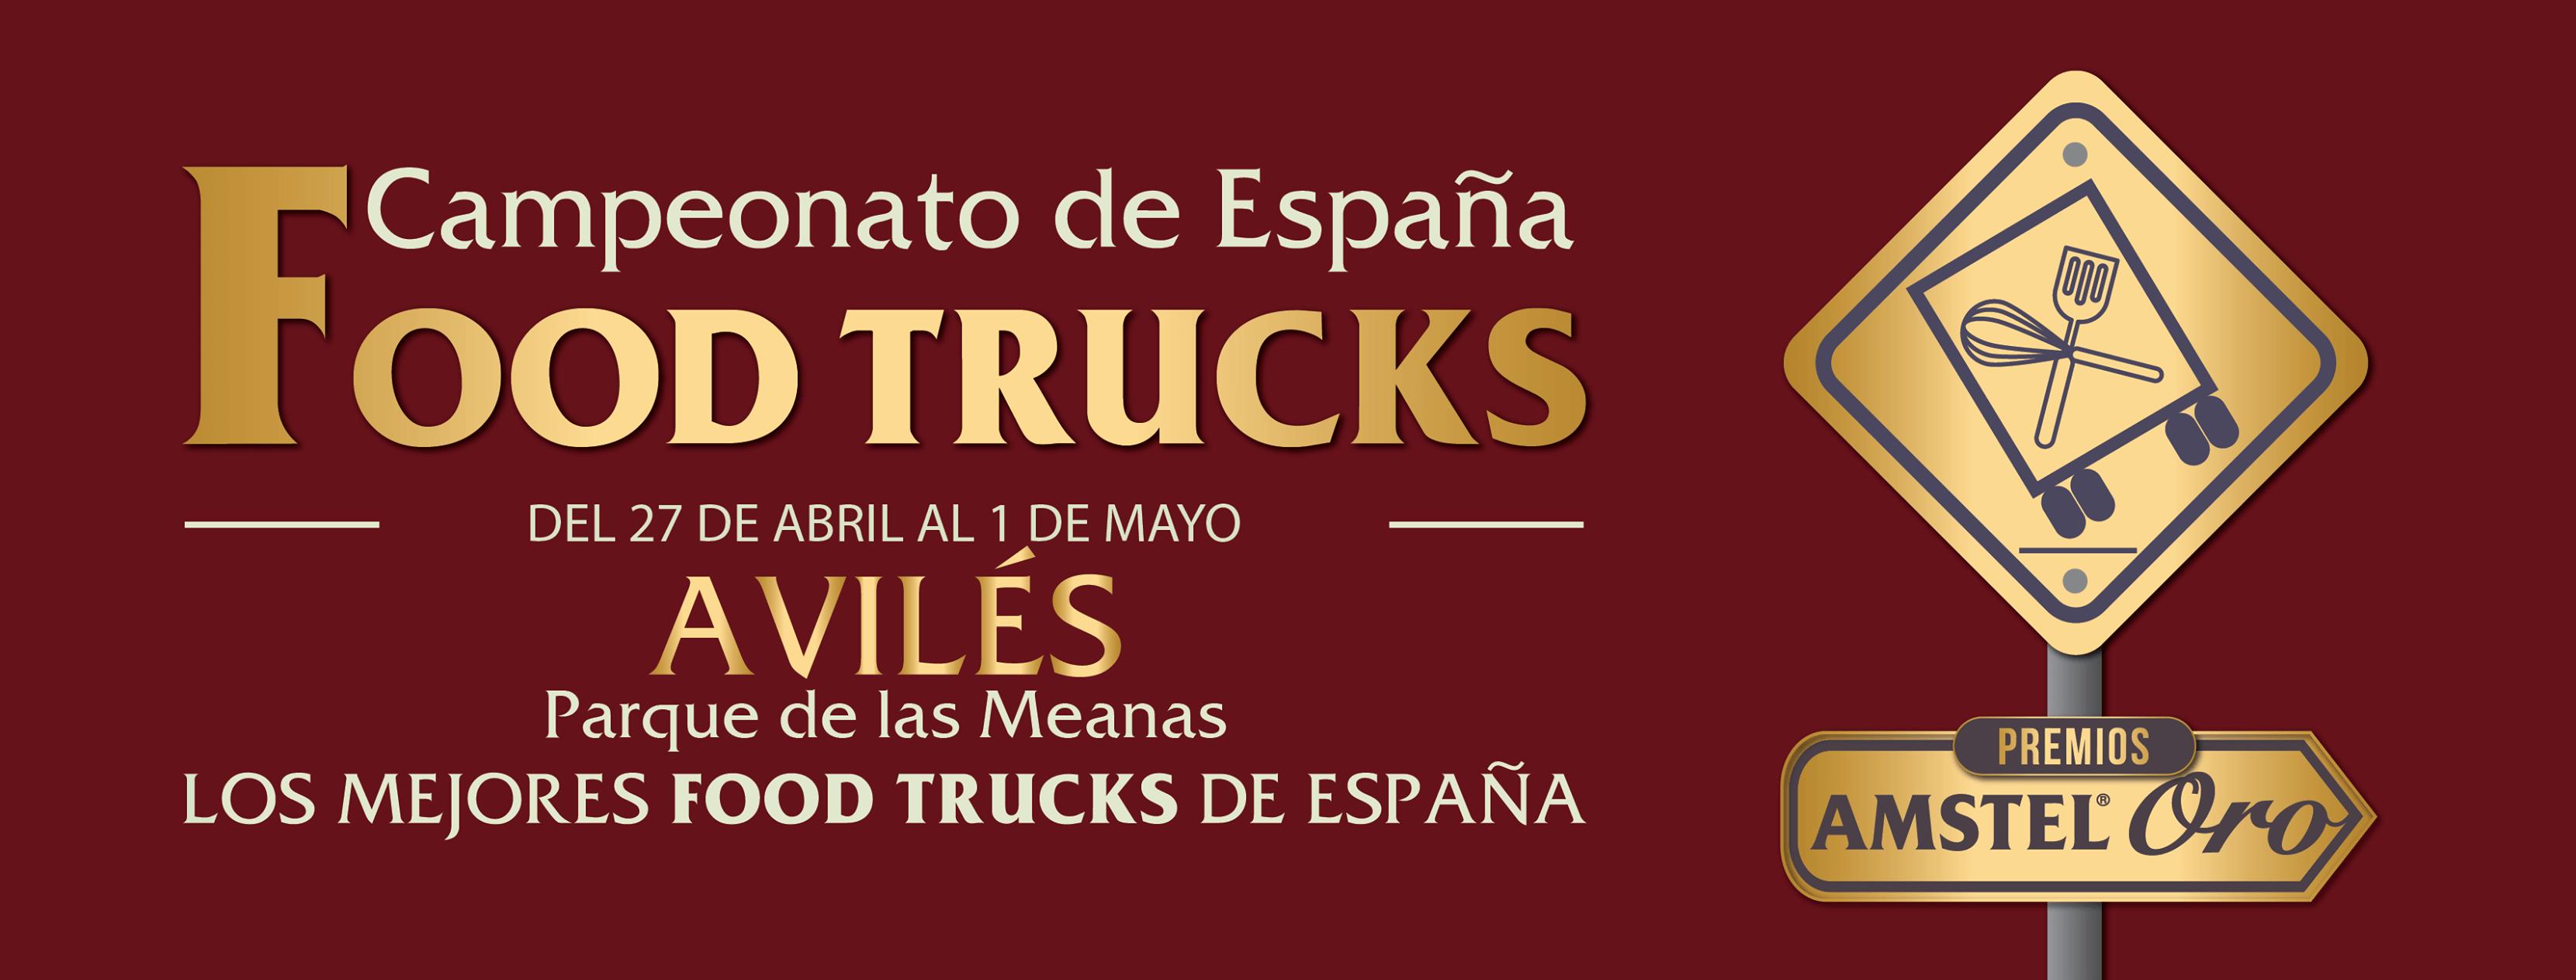 Photo of Campeonato de España de Food trucks 2018